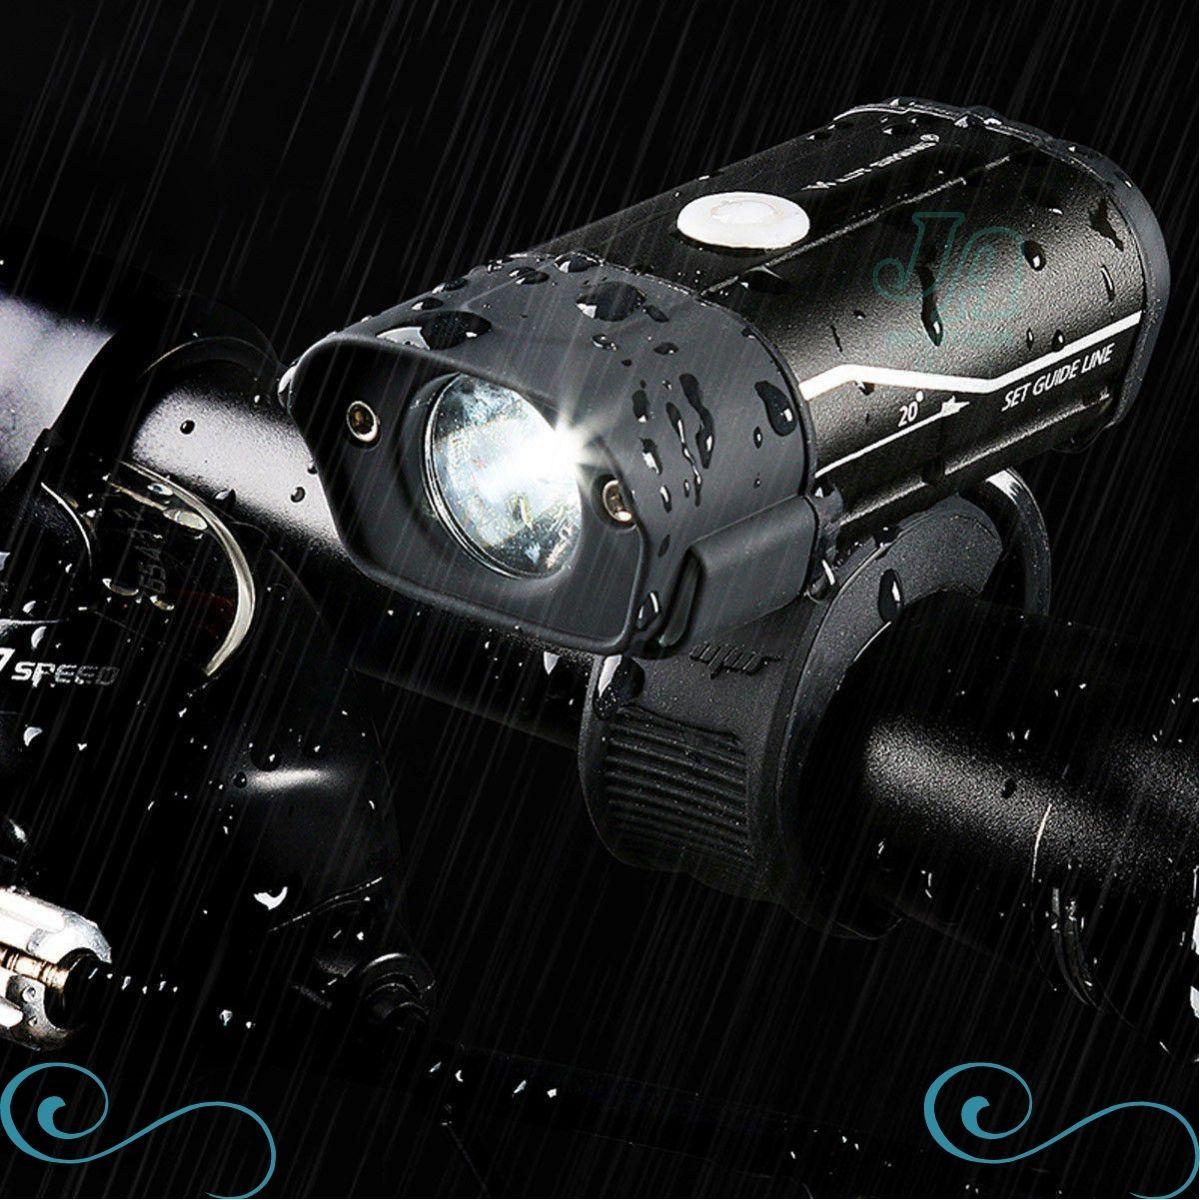 Farol Lanterna Bike Recarregável Usb Super Led L2 Gb-788